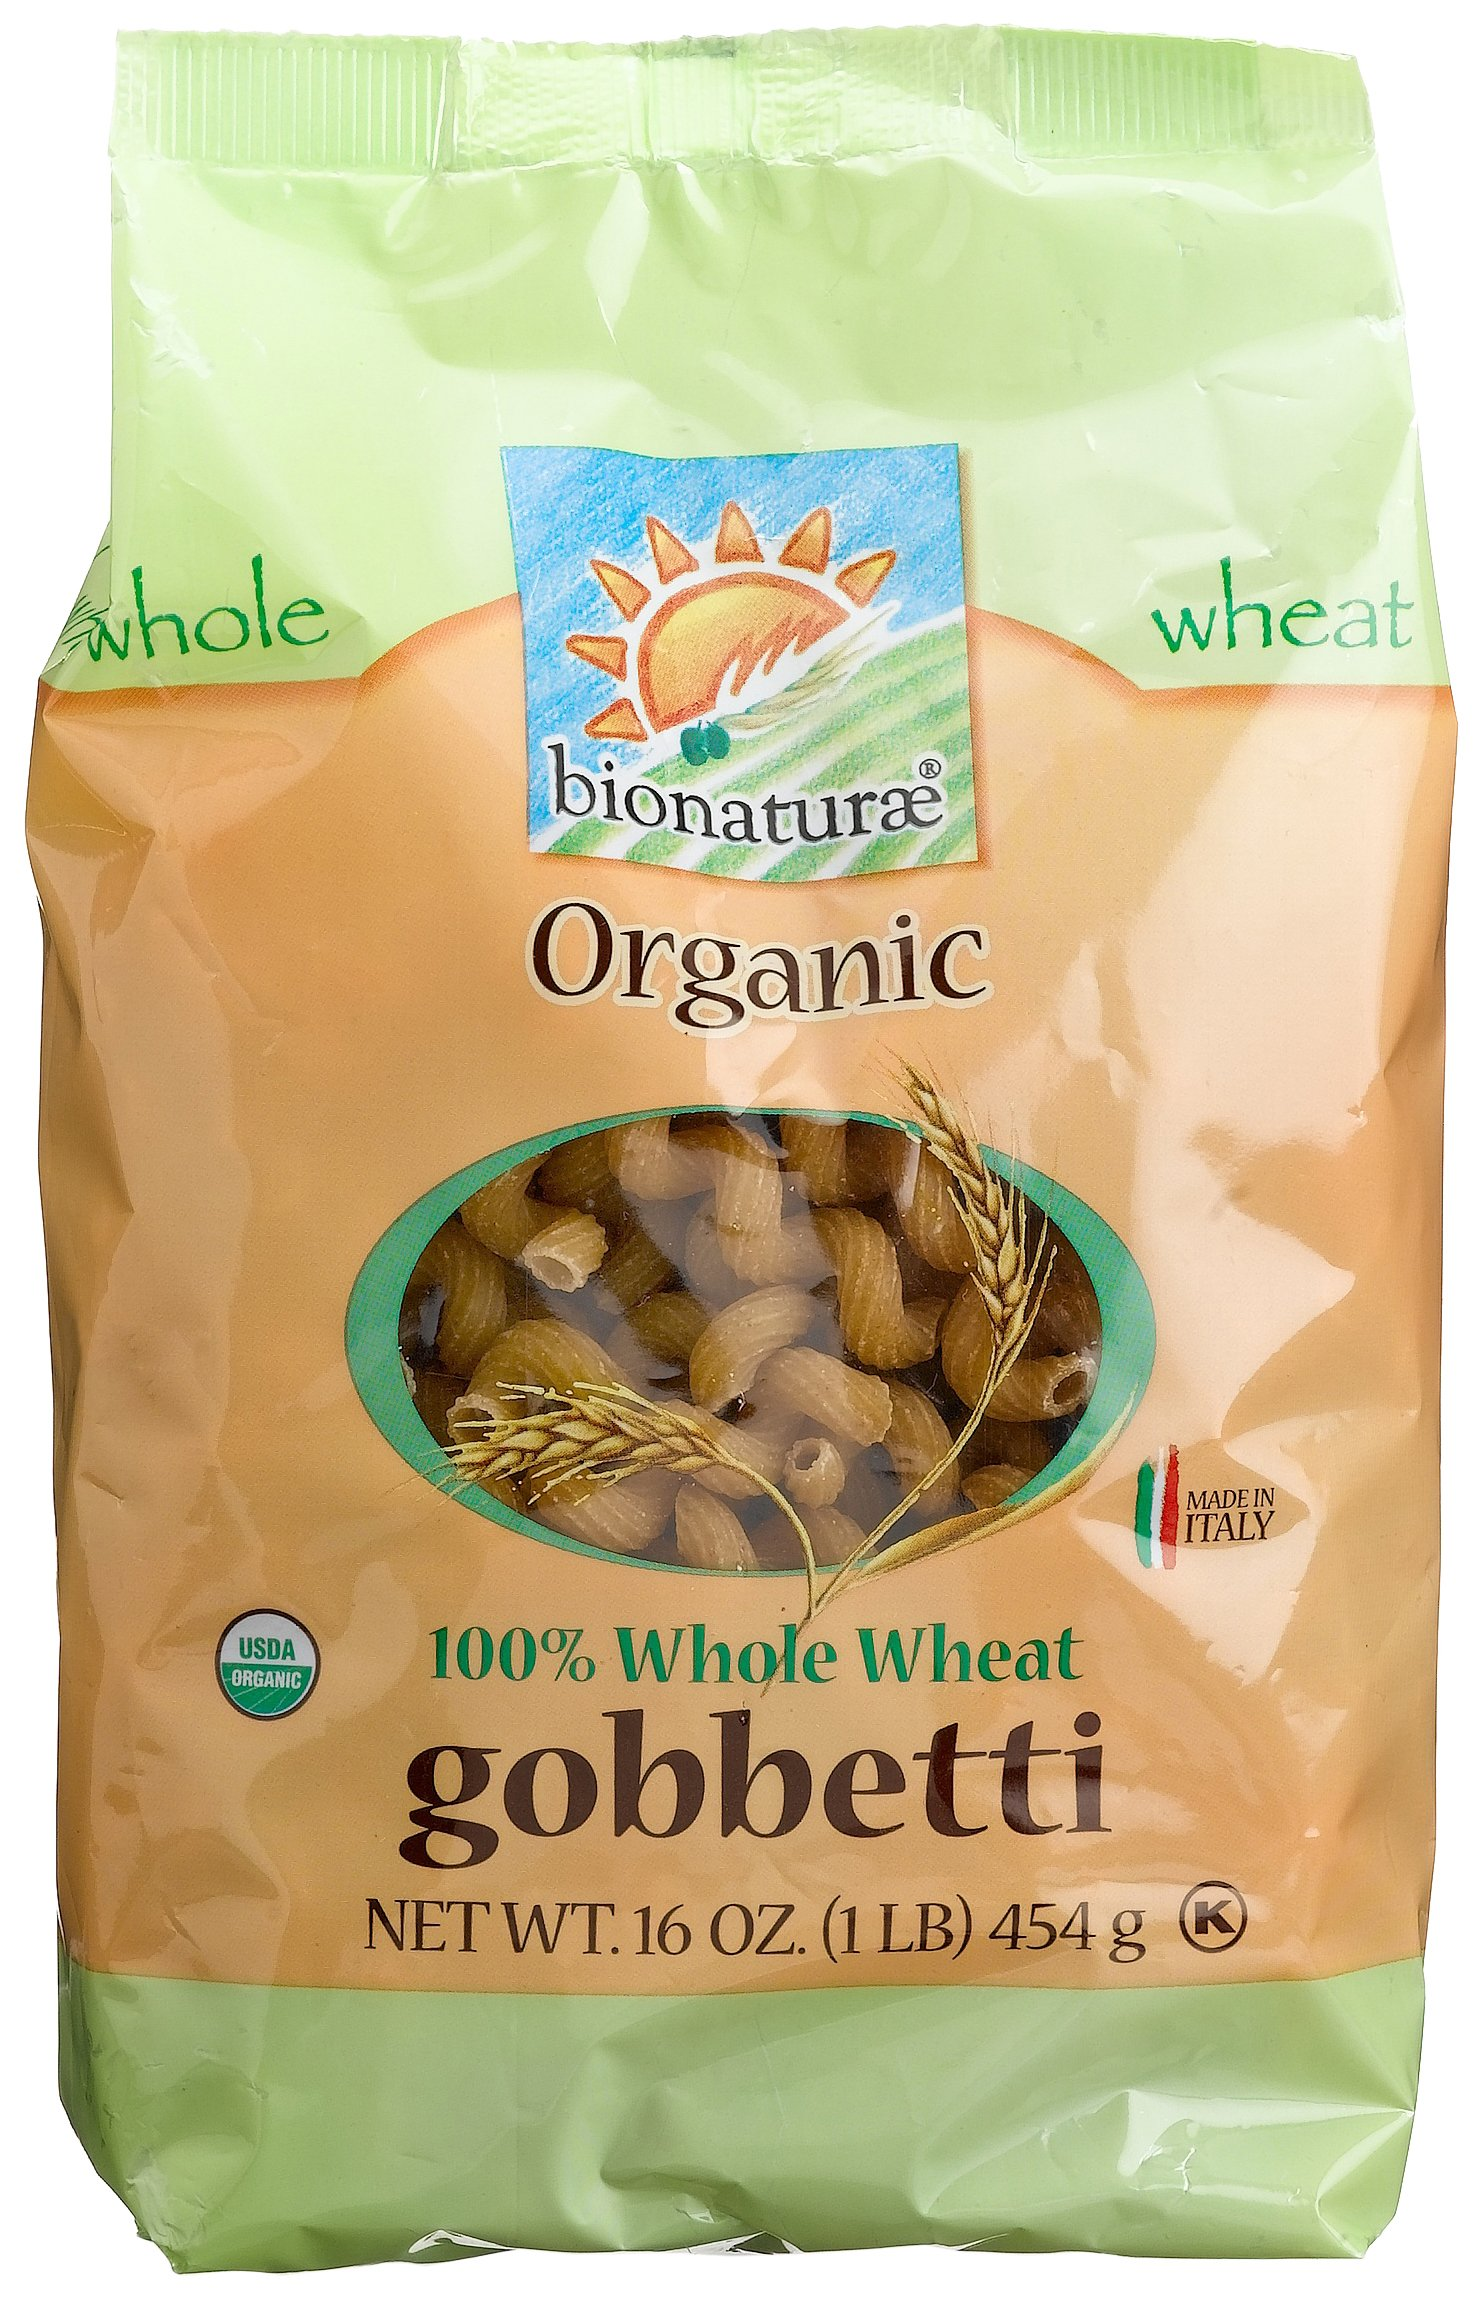 bionaturae Organic Whole Wheat Gobbetti, 16 Ounce Bags (Pack of 12) by bionaturae